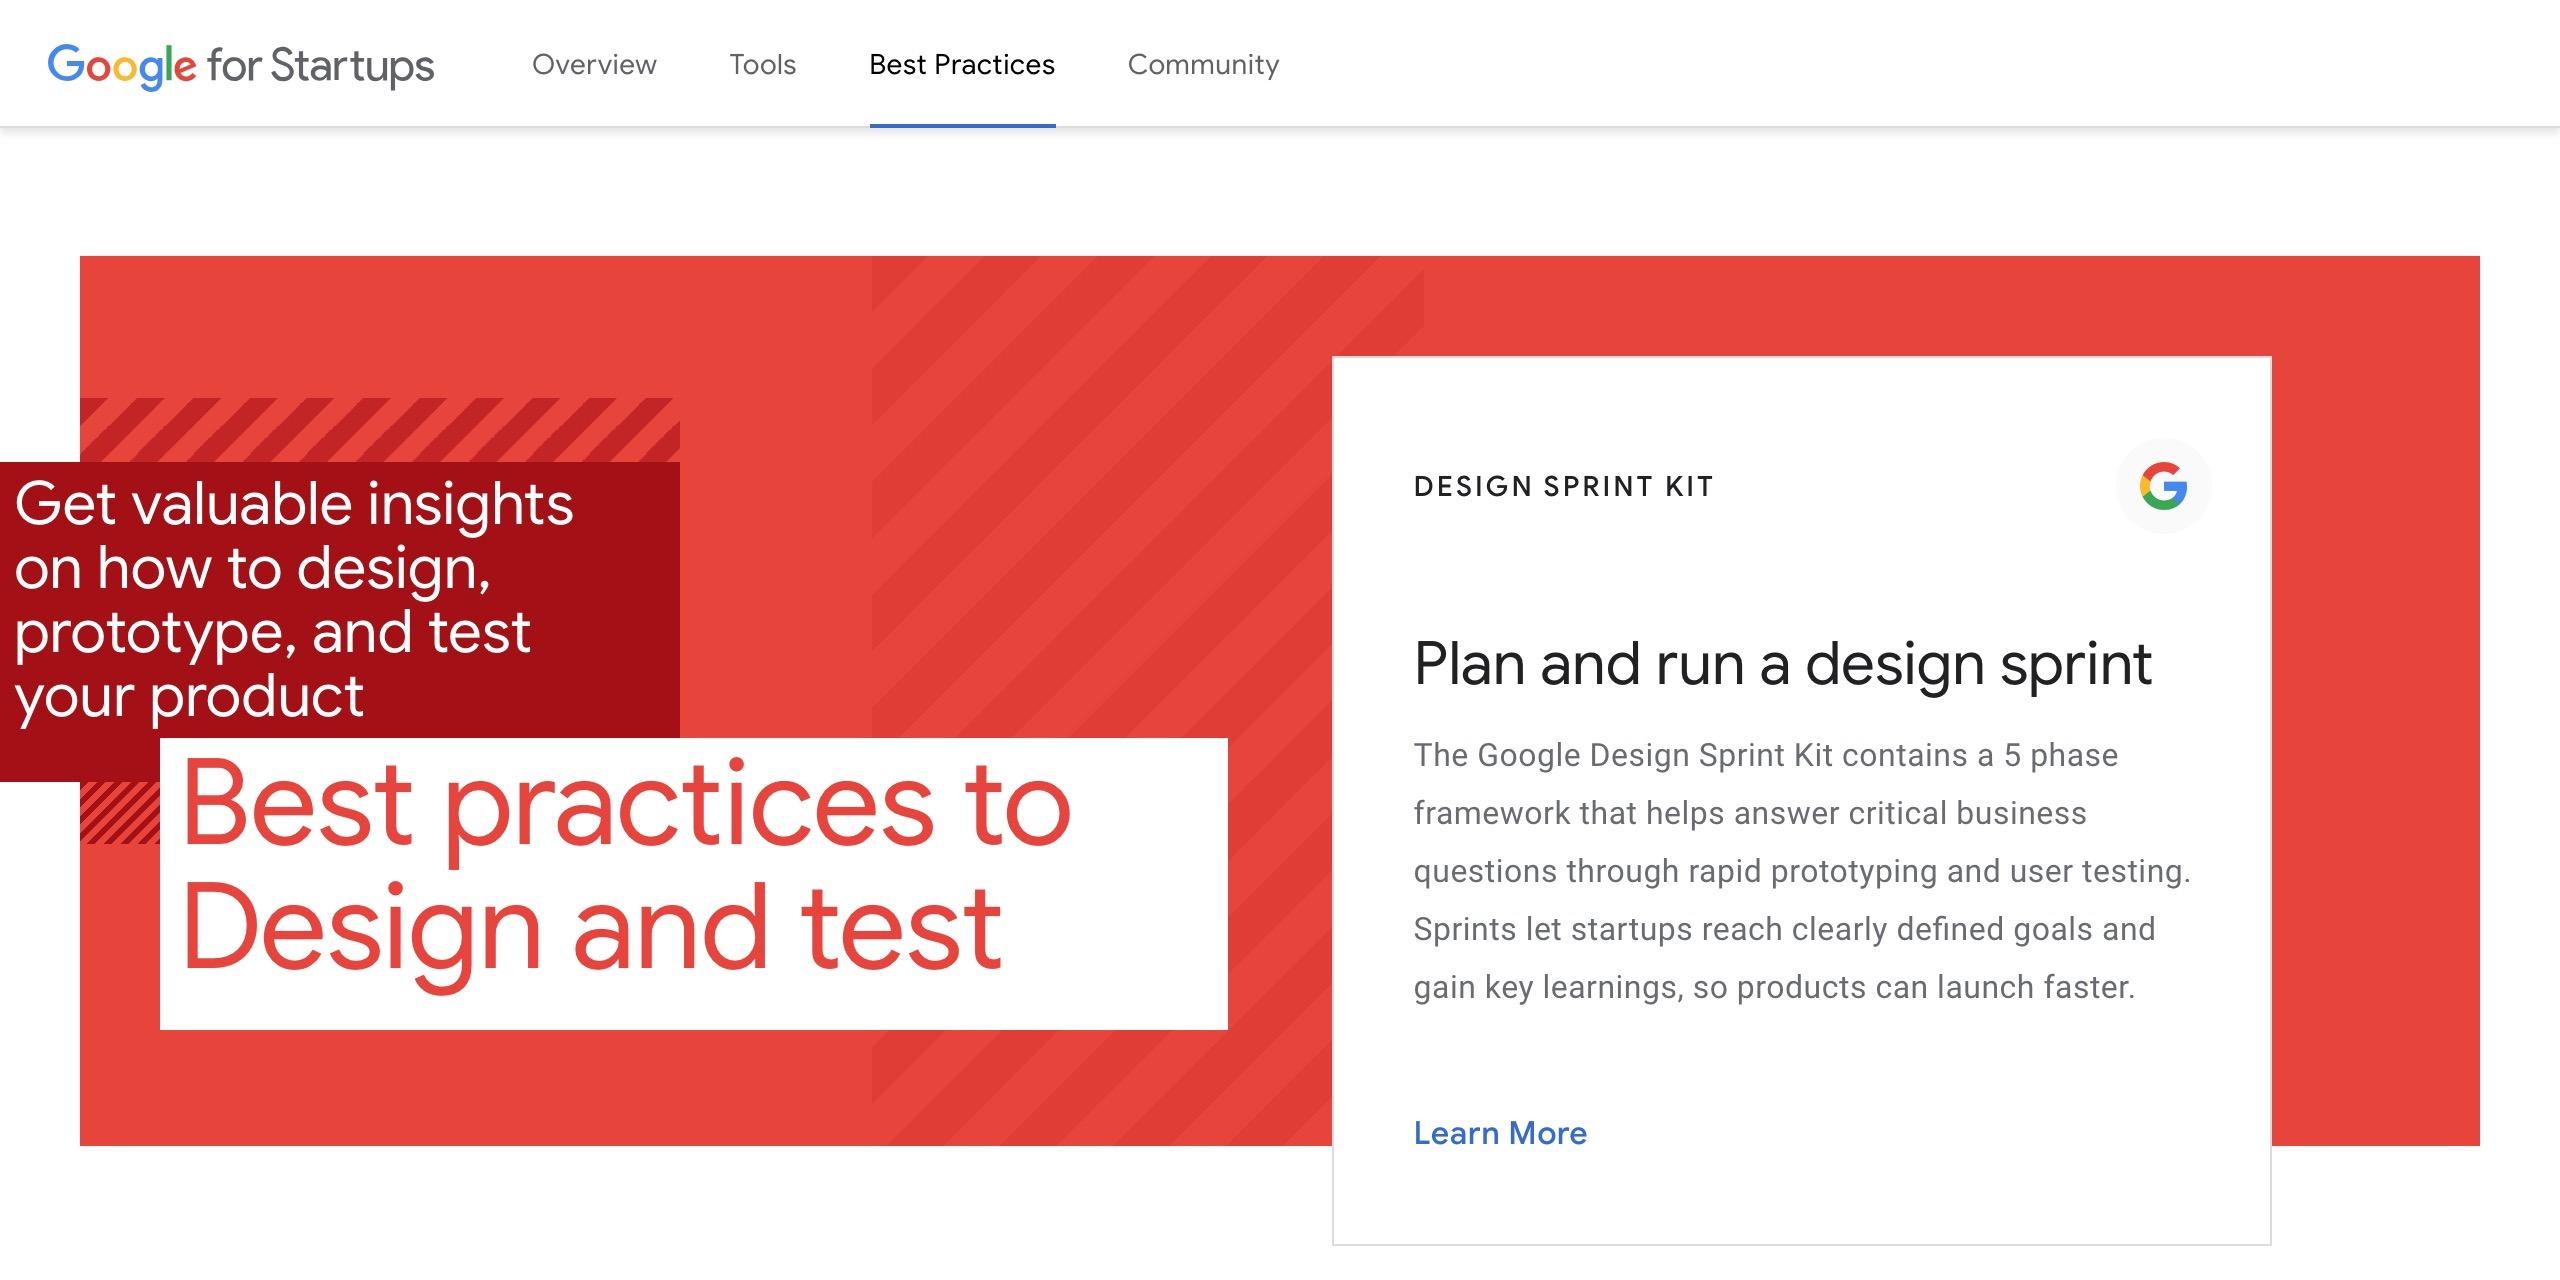 google for startups gets a rebrand and mentorship workspace residency program